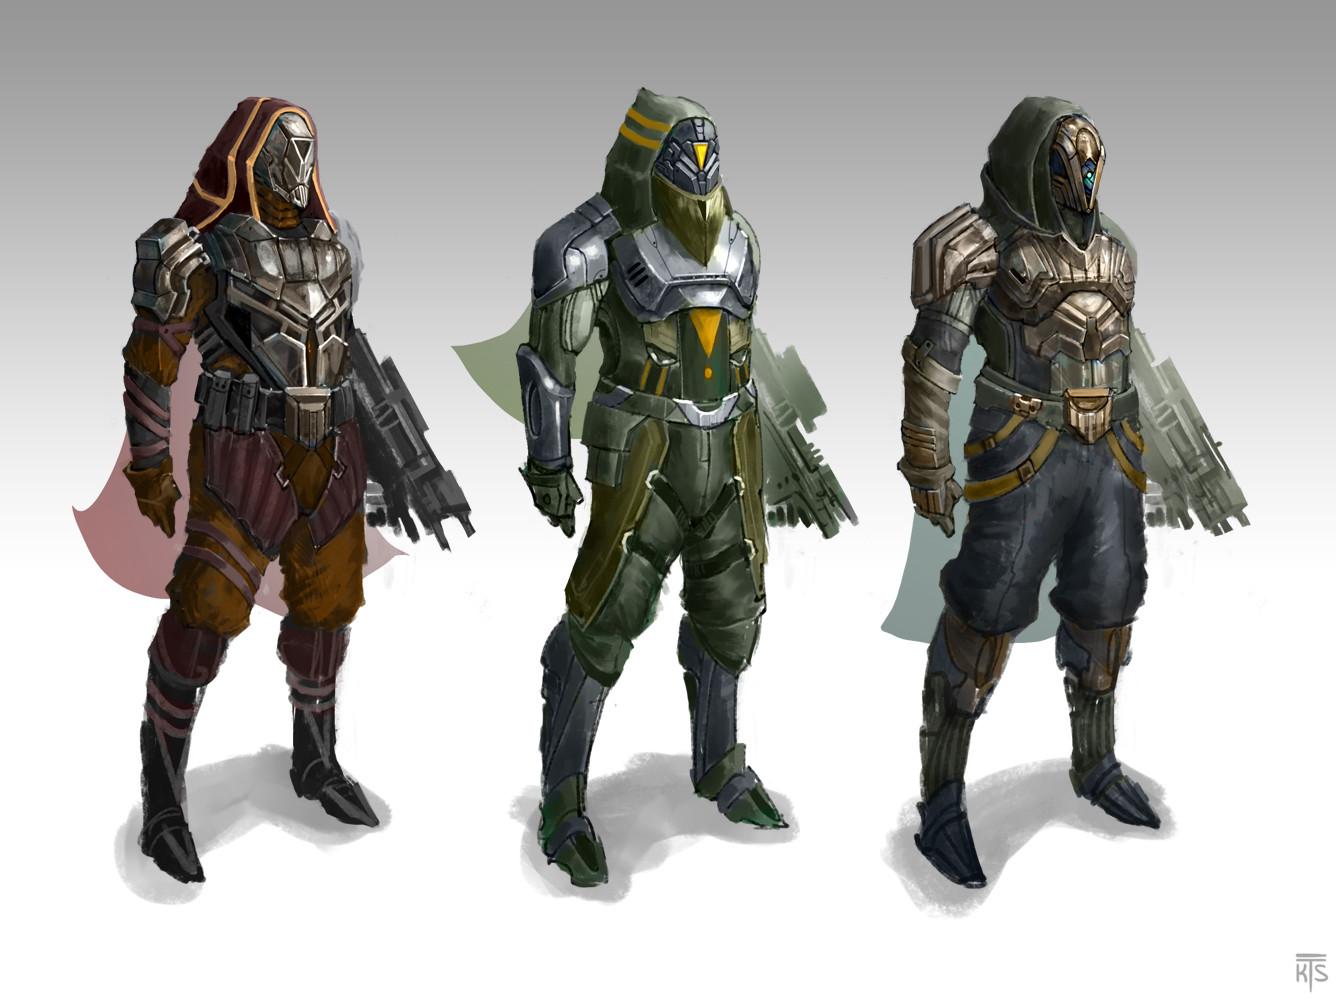 Destiny 2 Kings Fall Wallpaper Destiny The House Of Wolves Exotic Armor For Hunter